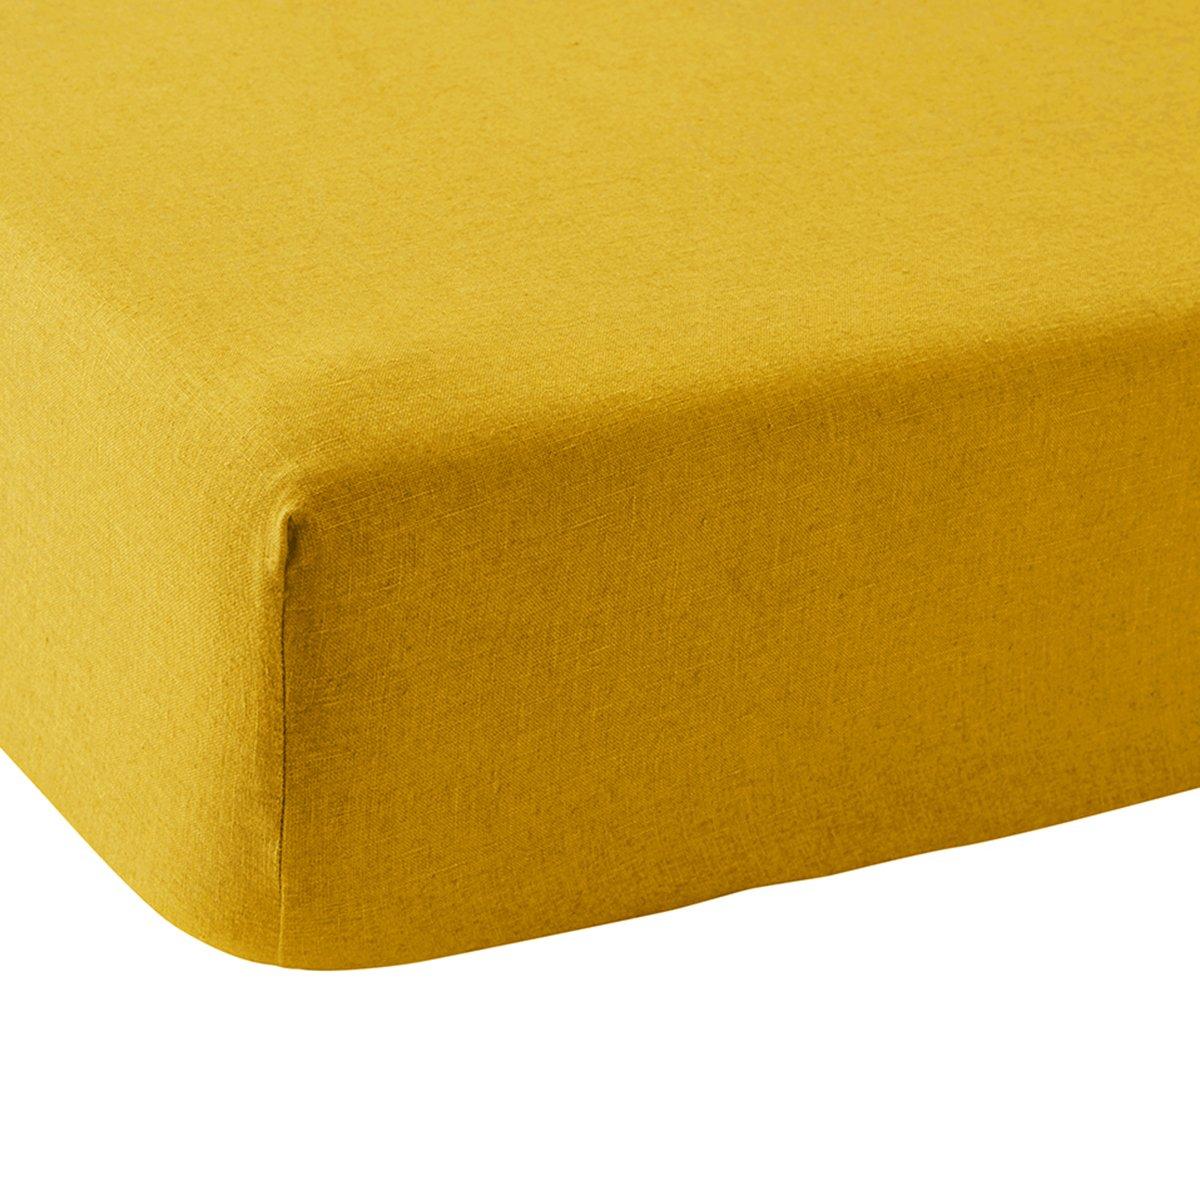 Drap housse lin 90x190 cm miel